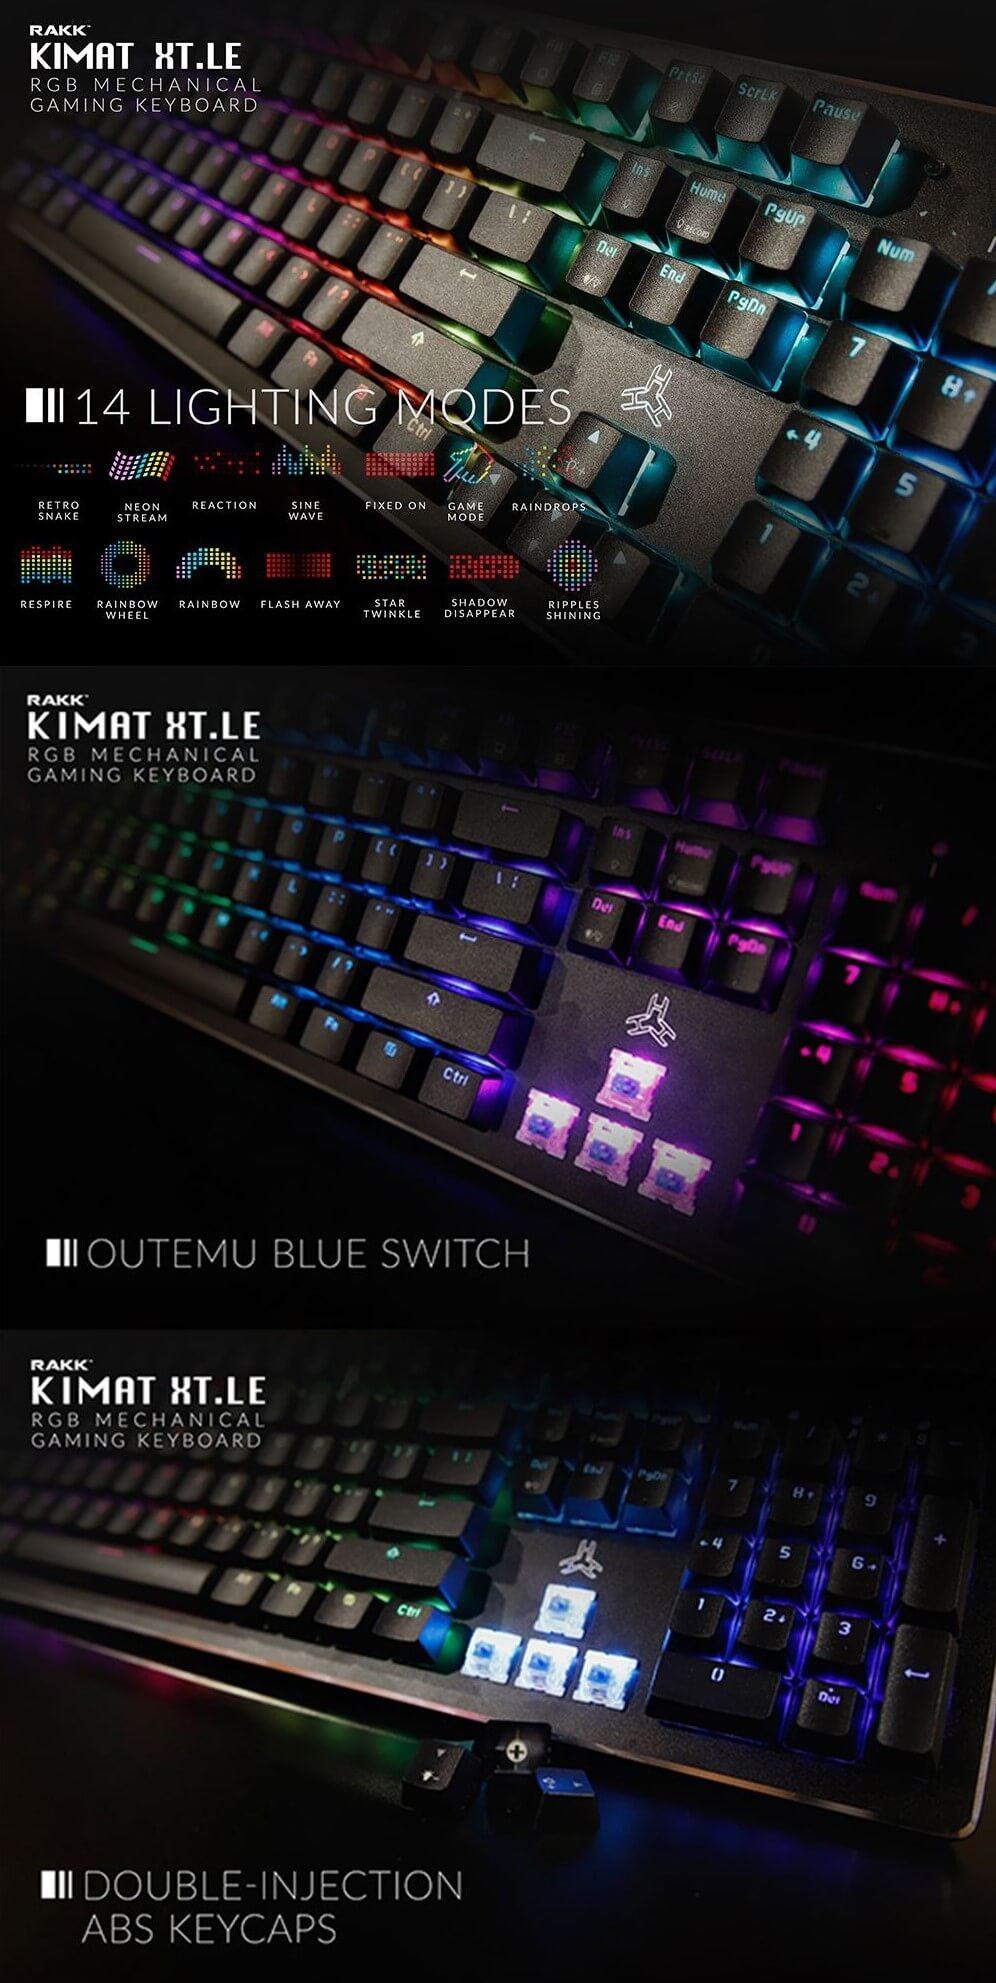 Rakk Kimat XT LE RGB Mechanical Gaming Keyboard, Simple yet Elegant  Designed Keyboards Rakk Kimat XT-LE Keyboard Mechanical, Outemu Blue for  Clicky